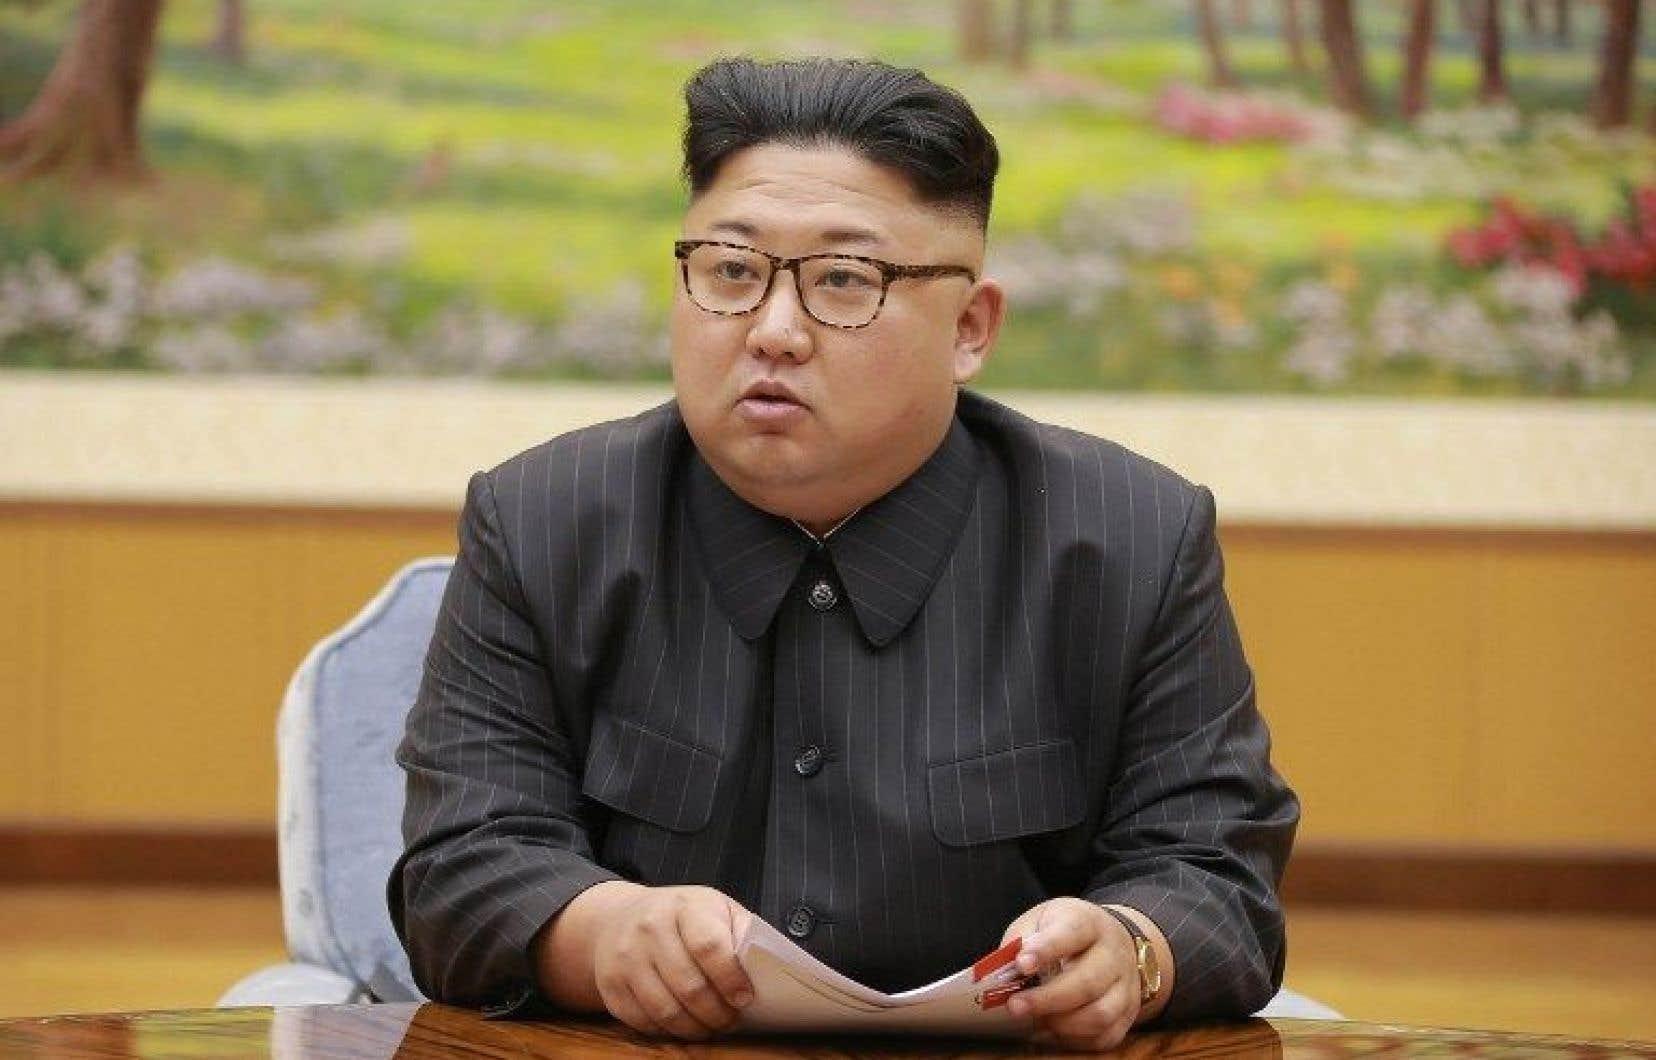 Le dirigeant nord-coréen, Kim Jong-un